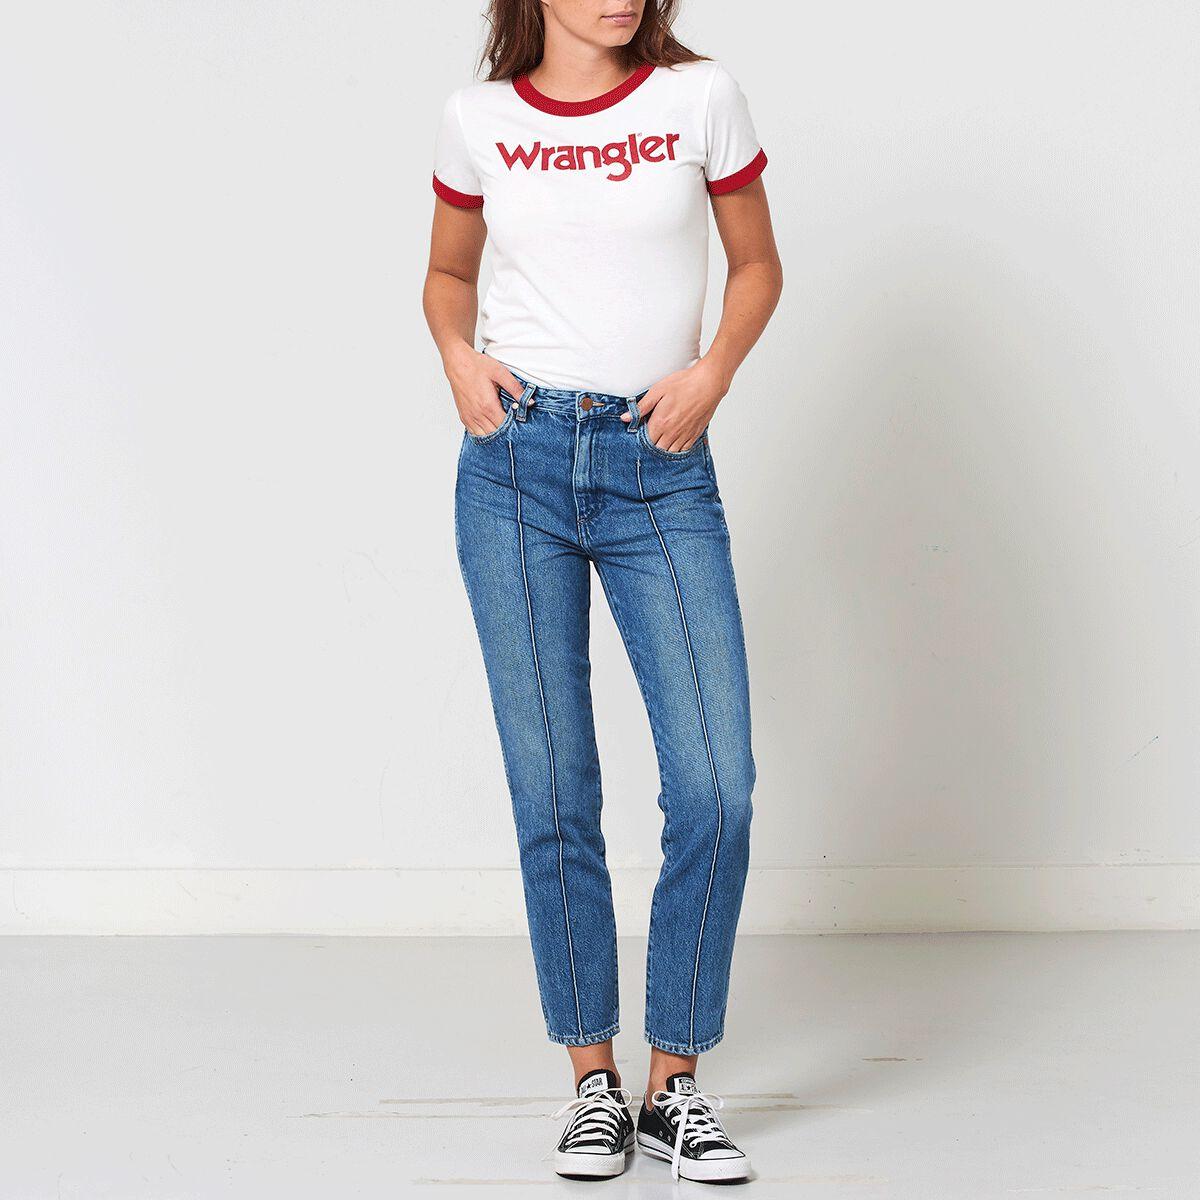 Women Jeans Wrangler Retro slim Blue Buy Online 0d1b93e4af